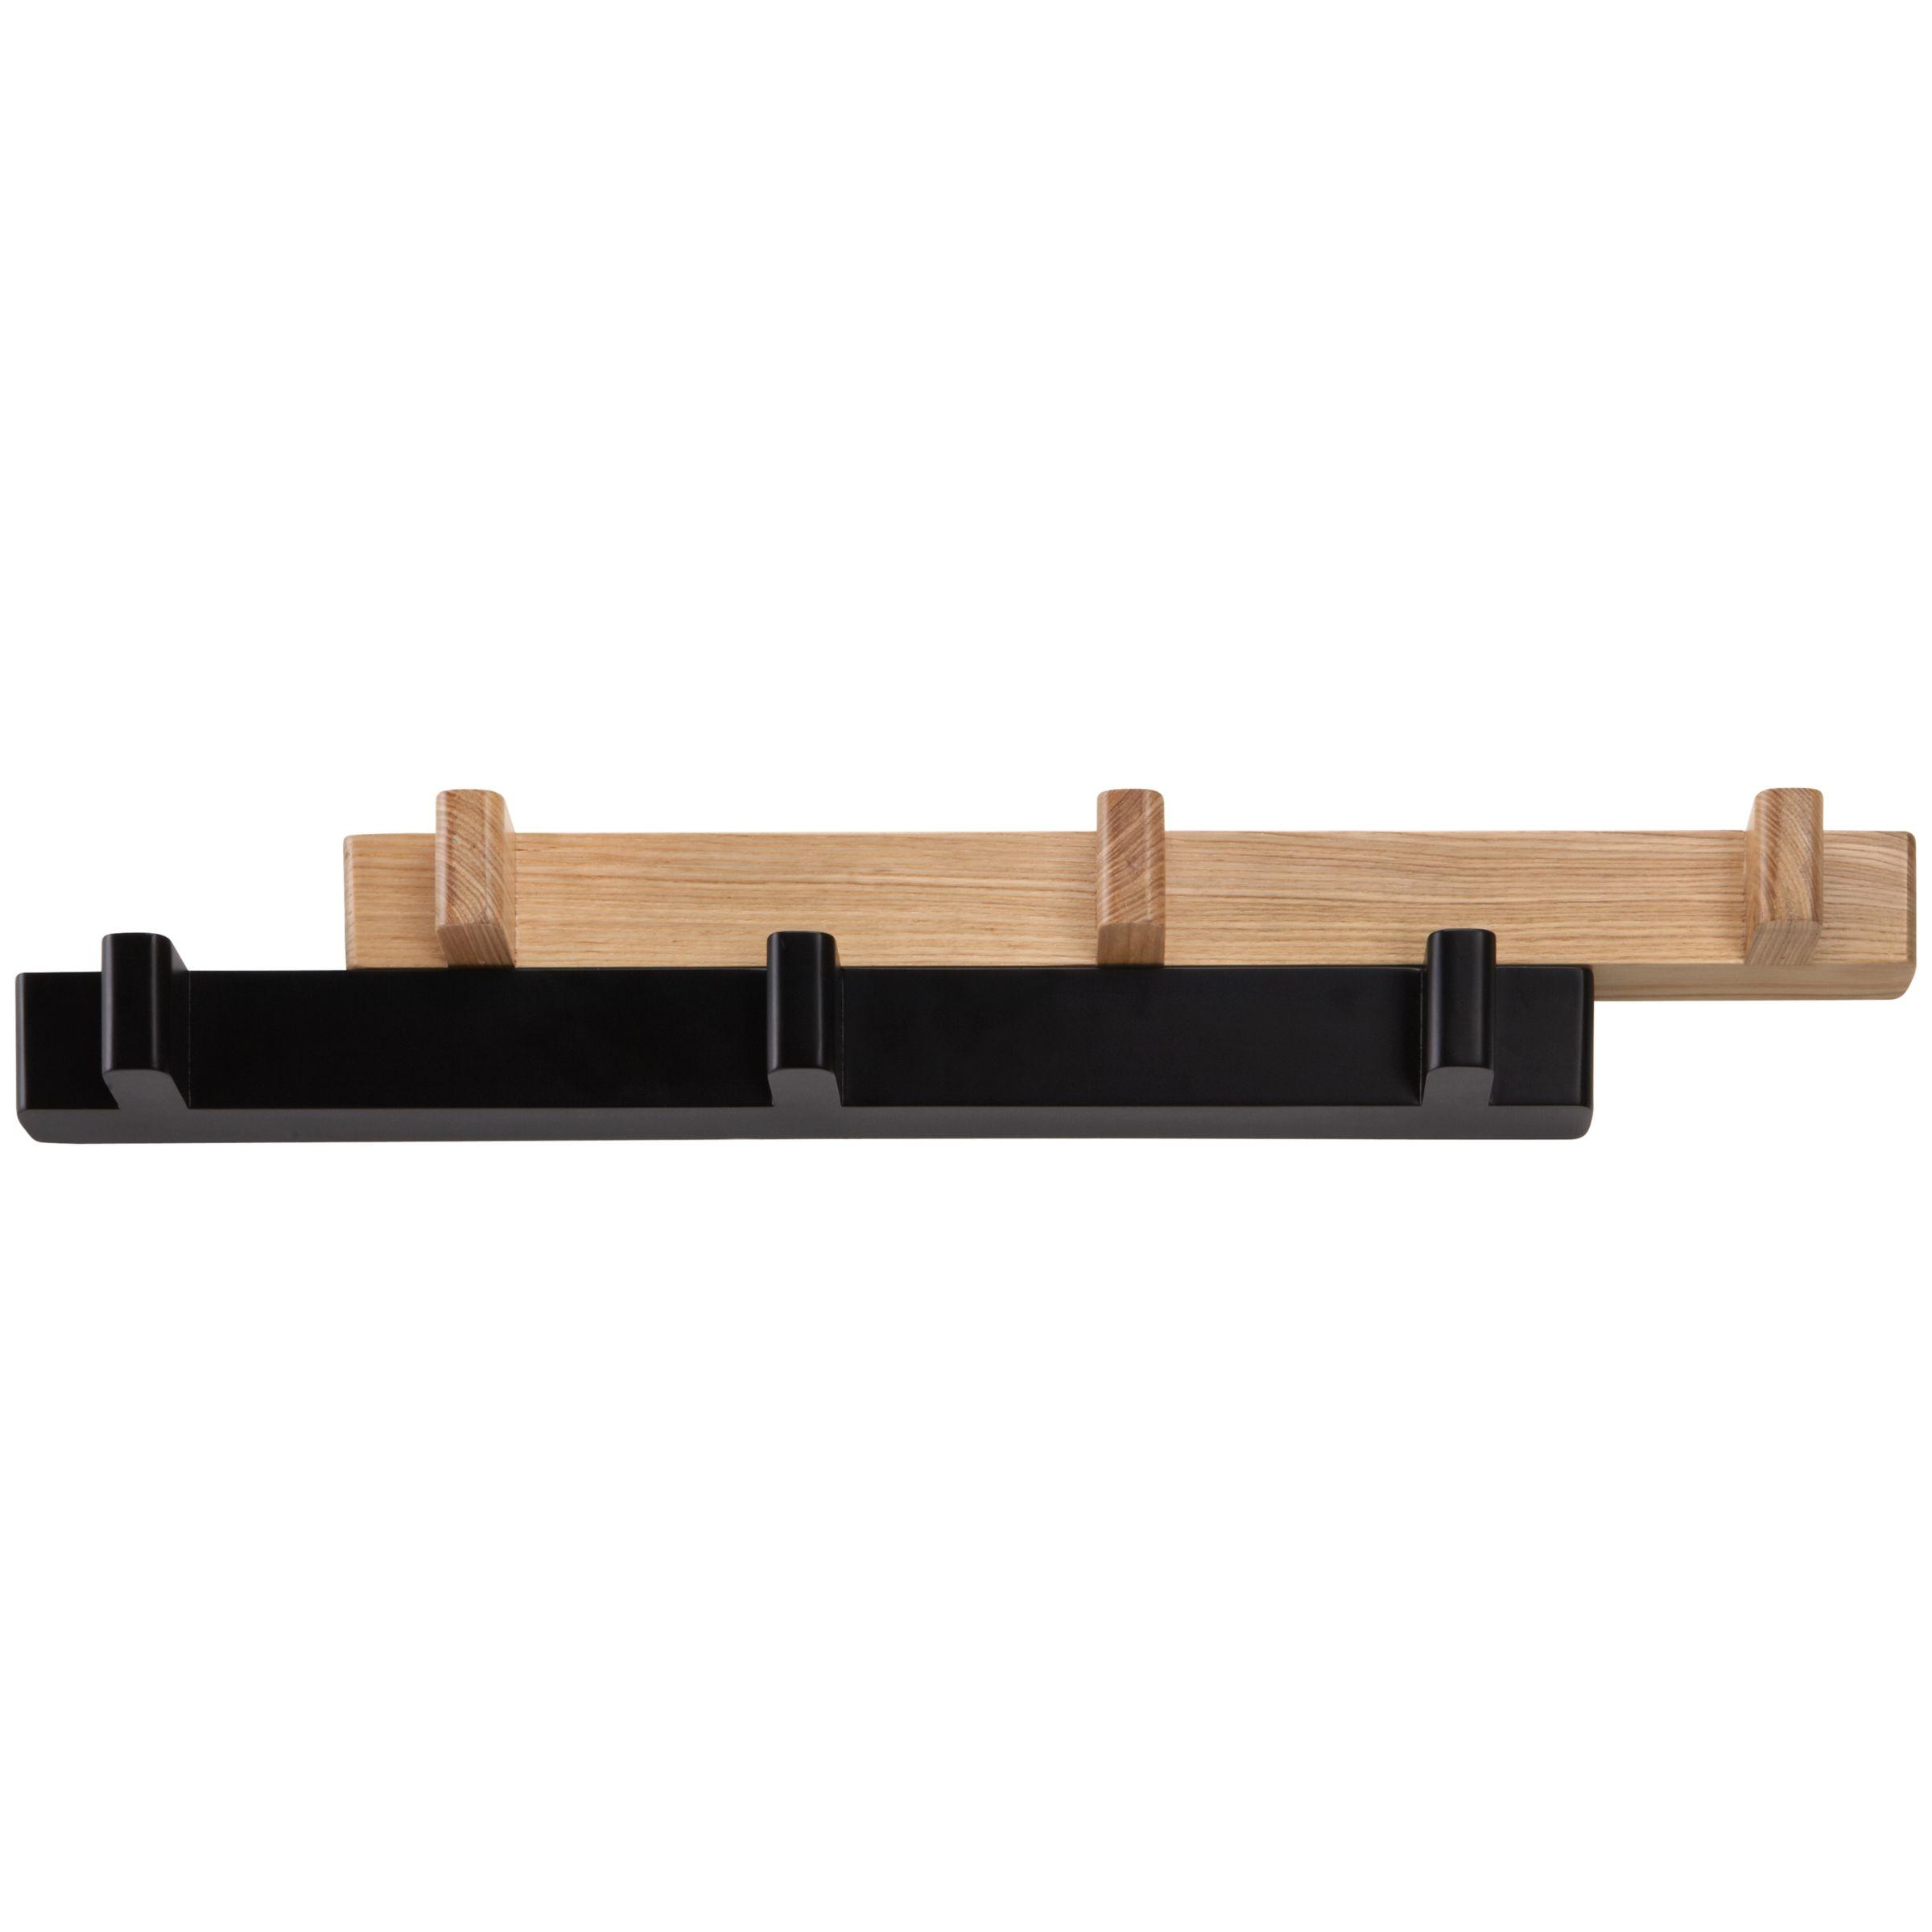 Umbra Umbra Switch Hooks, Black / Natural